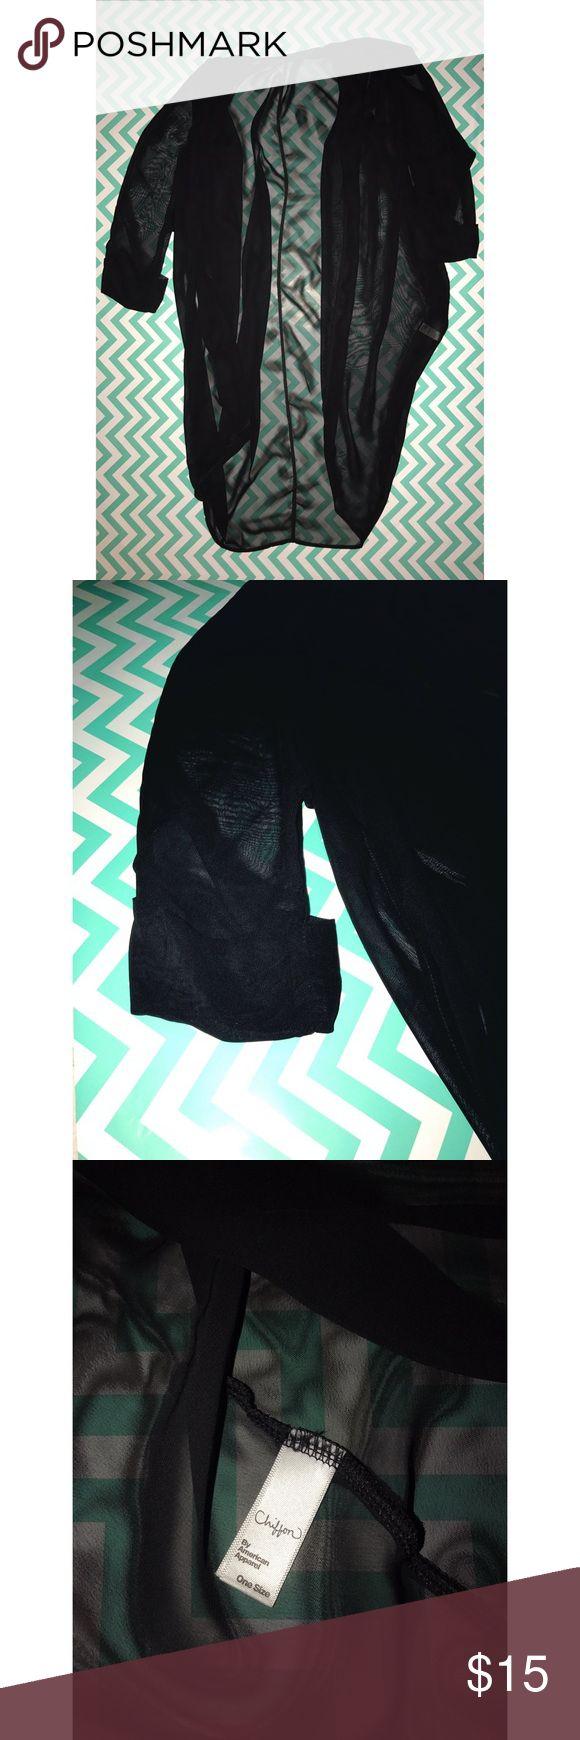 American Apparel chiffon shawl. New like used. American Apparel chiffon shawl. New like used. No holes or snags. American Apparel Sweaters Cardigans